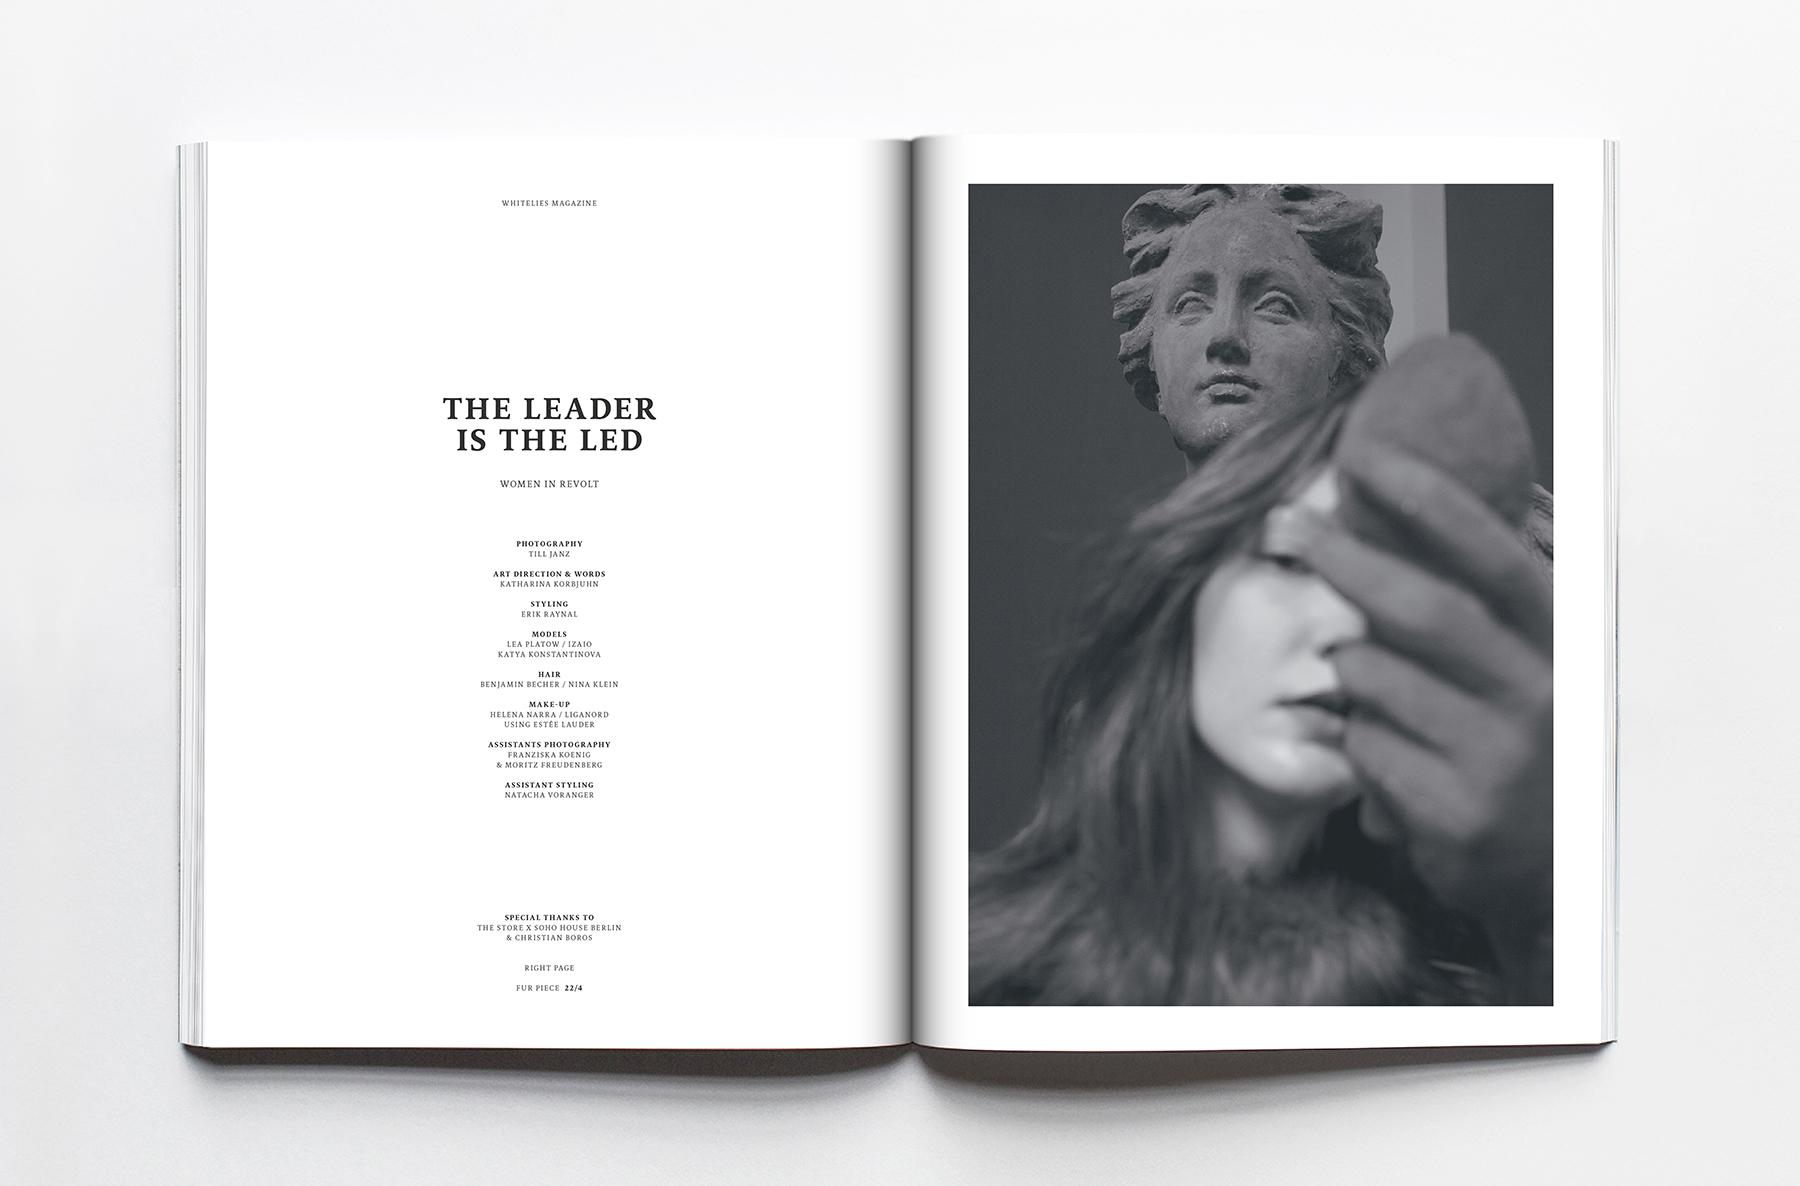 wla_magazine_42.jpg